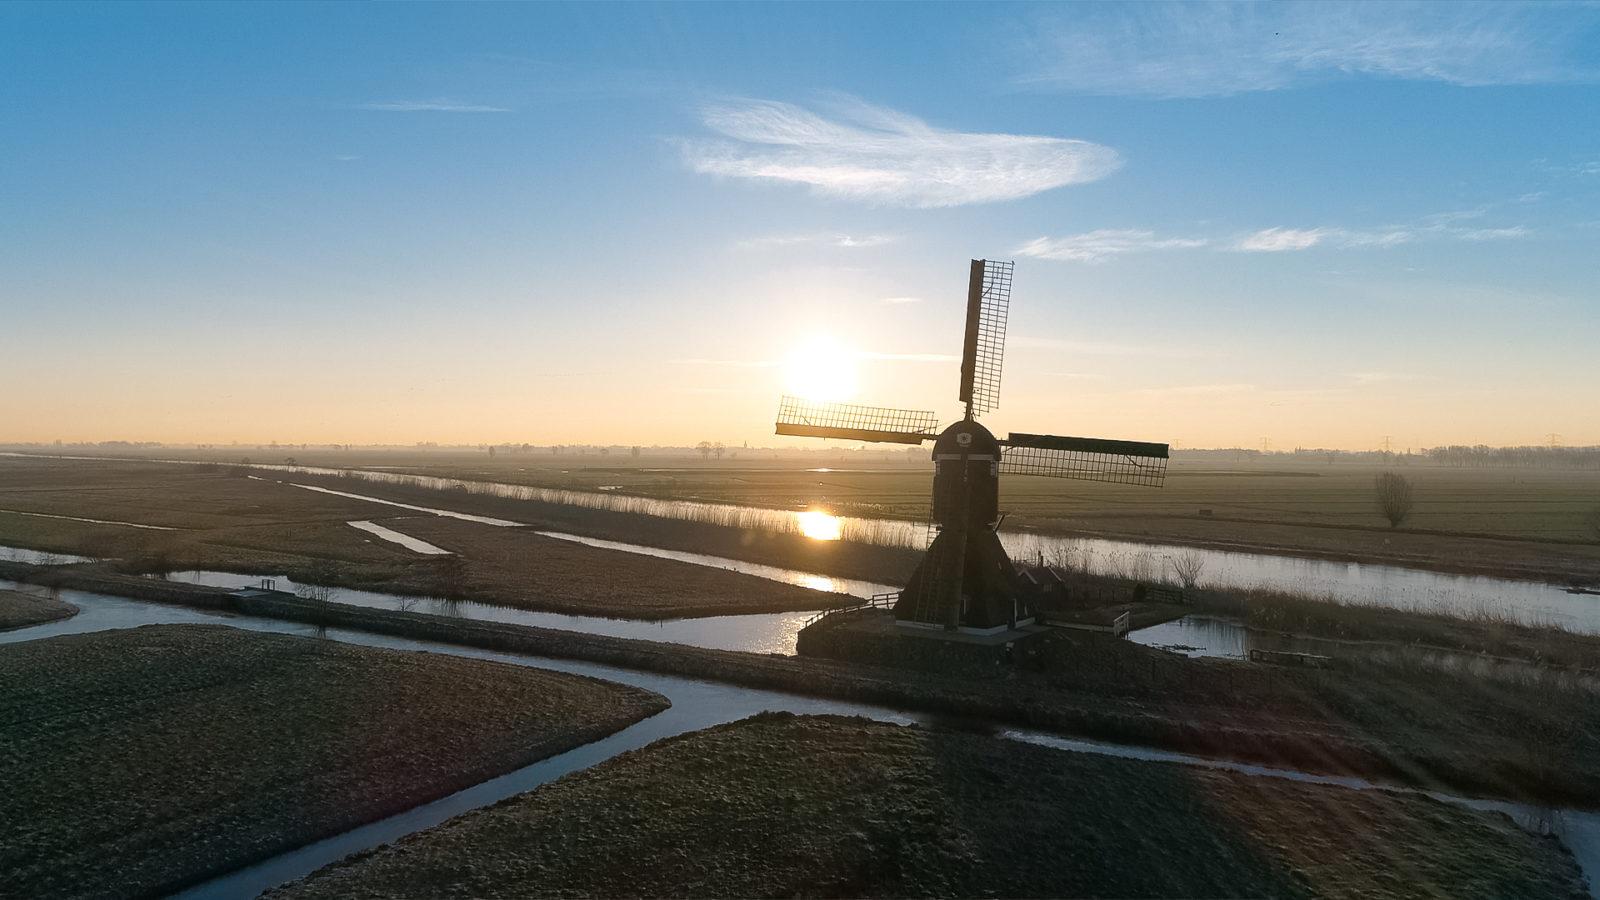 http://factandfable.nl//wp-content/uploads/2019/01/De-Molen-v2-2-1600x900.jpg